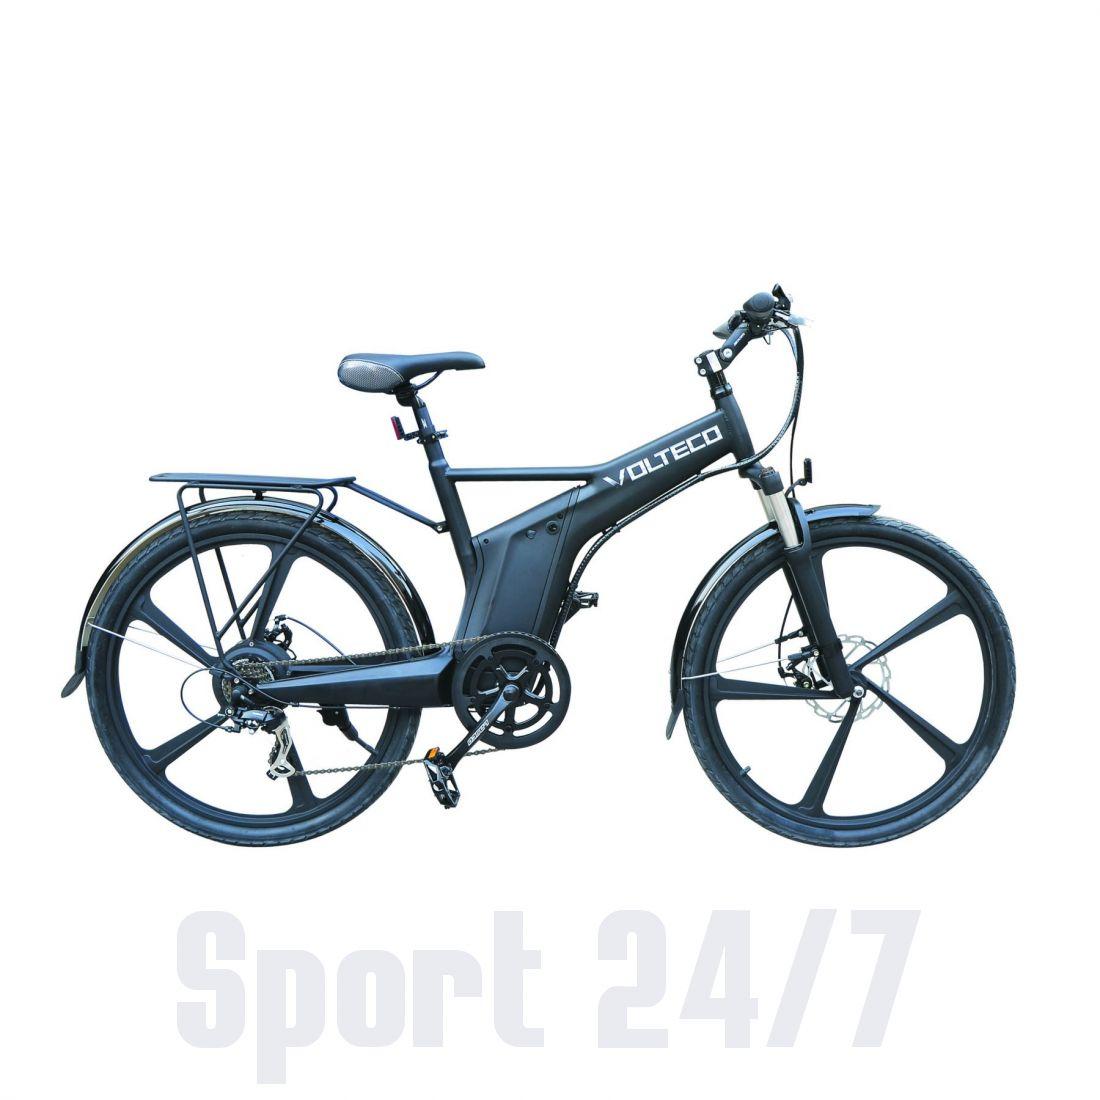 Электровелосипед Велогибрид WERWOLF (112-22)